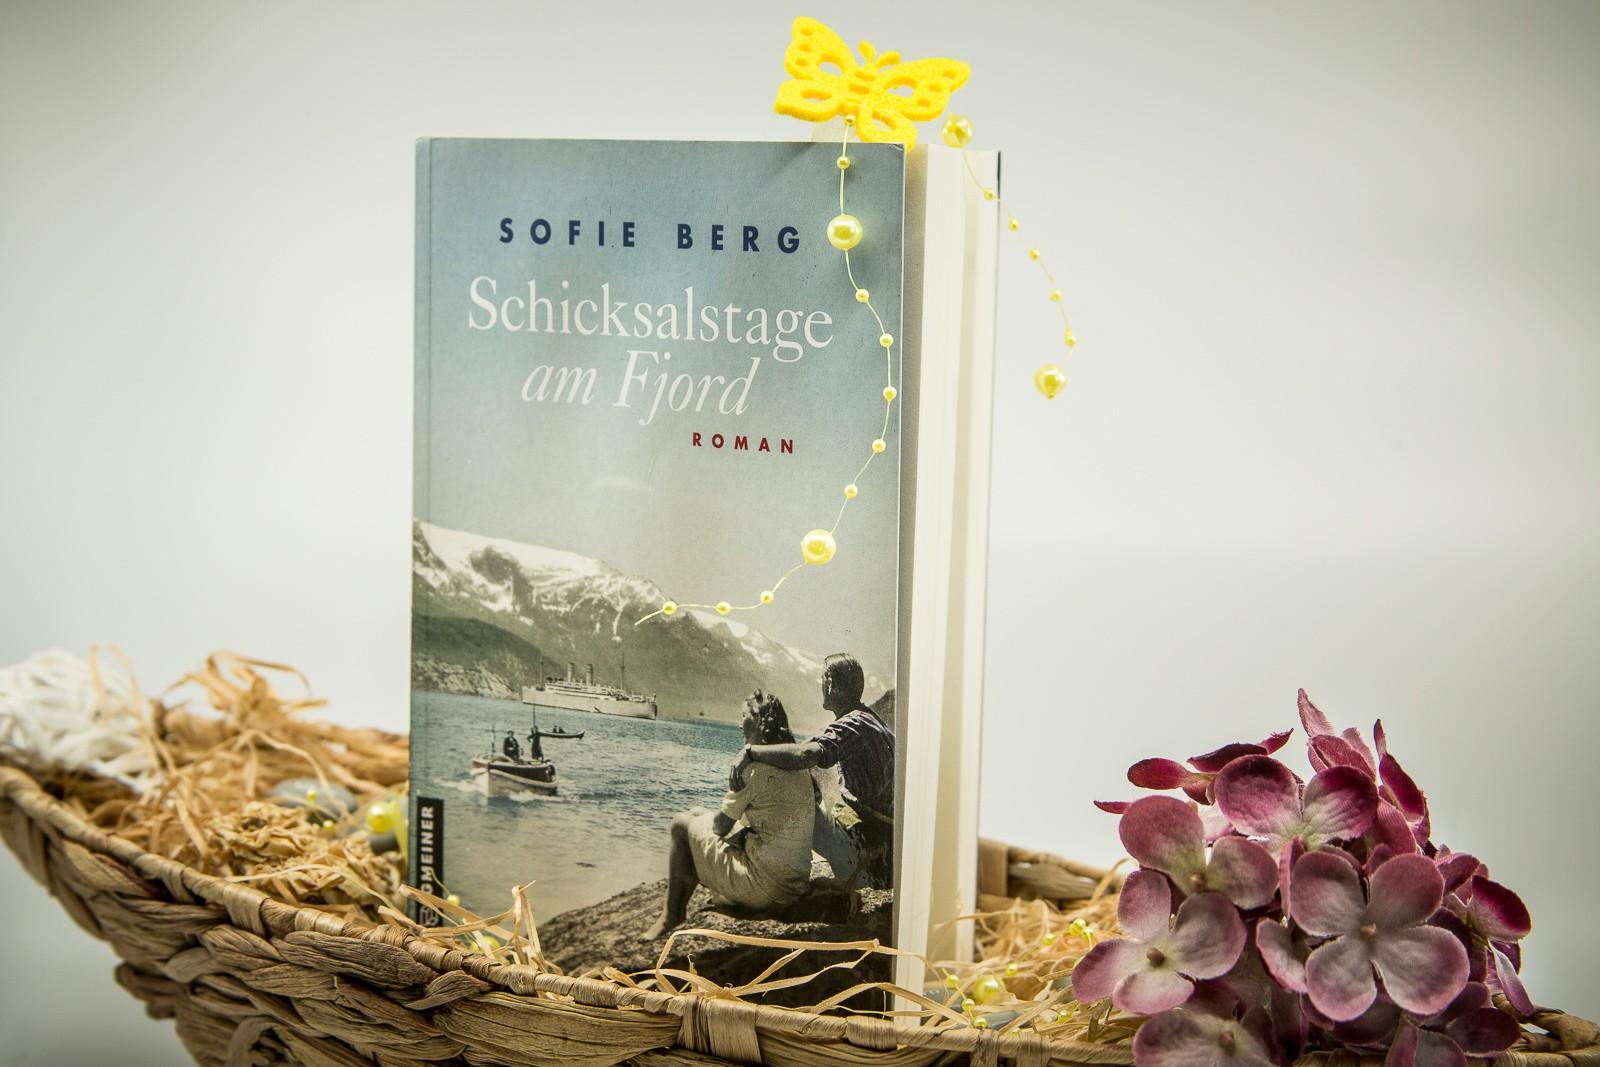 Schicksalstage am Fjord - Sofia Berg